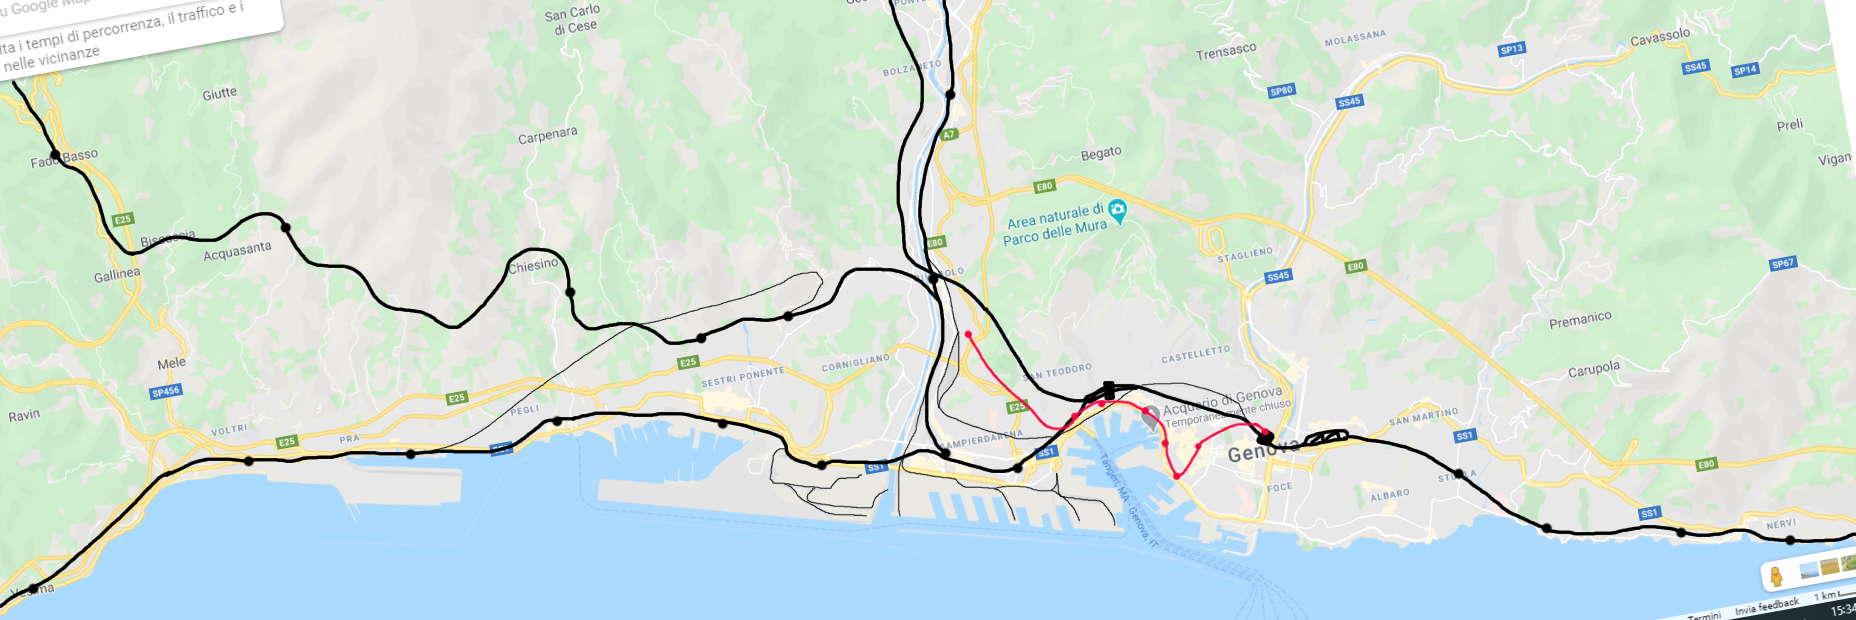 Genova Genoa Italy Mod Transport Fever 2 Mod Download